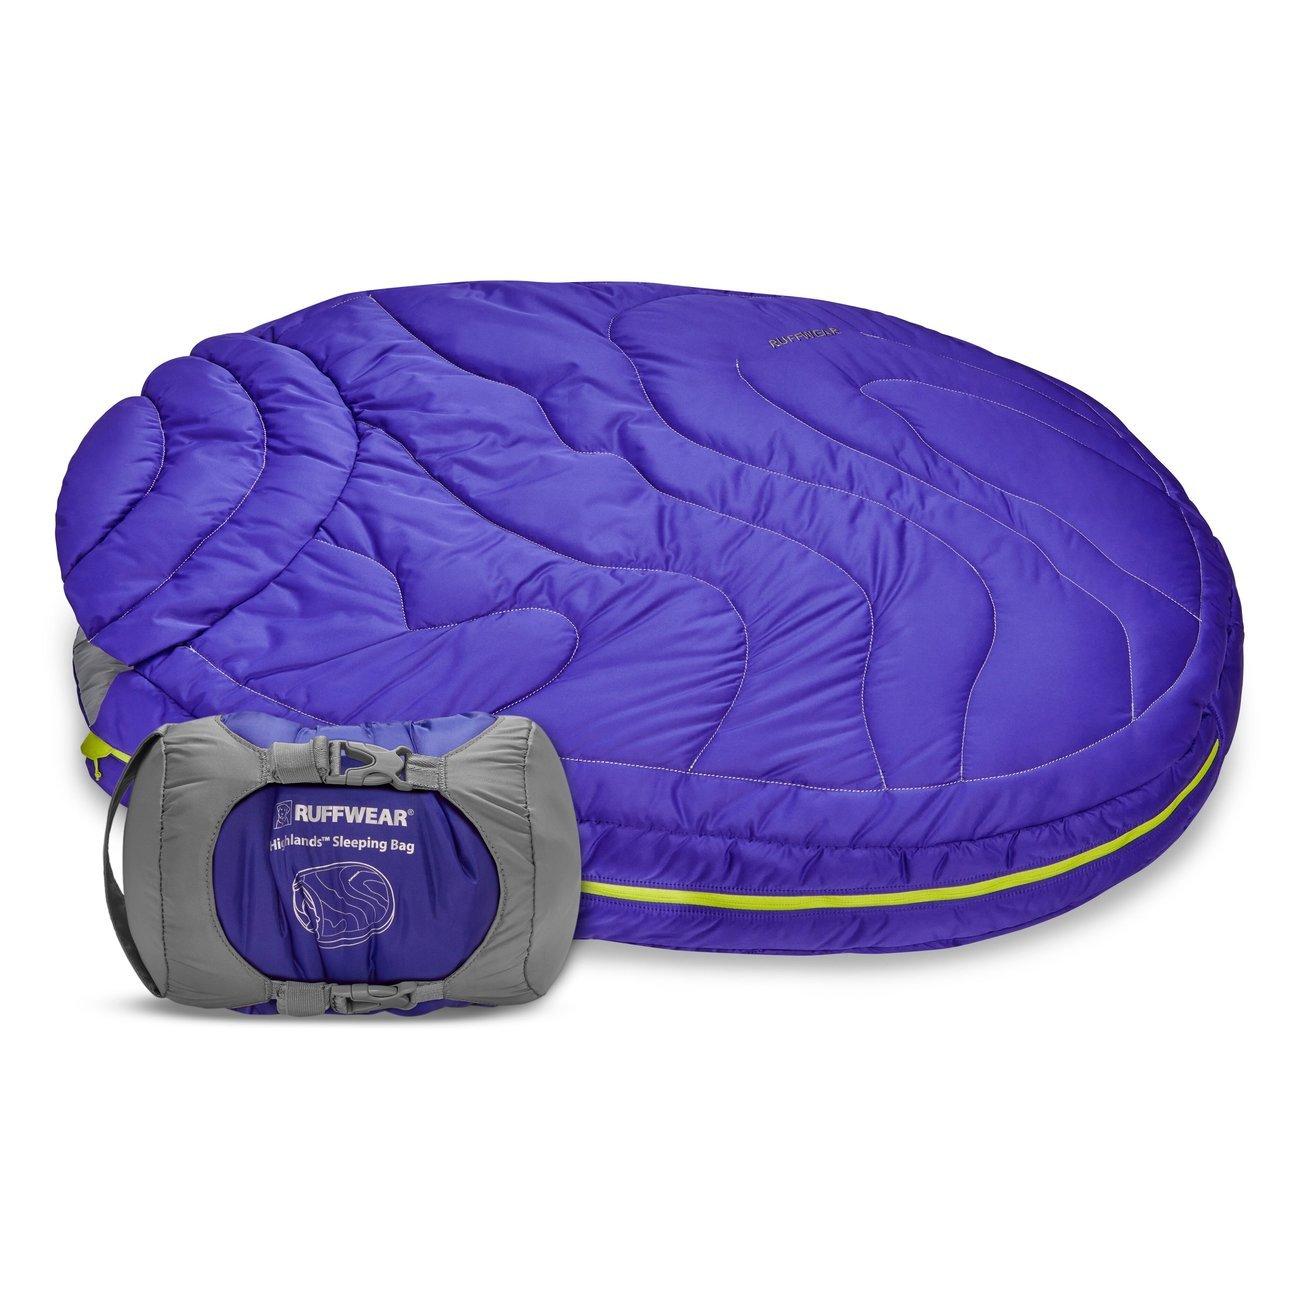 Ruffwear Highlands Sleeping Bag™ Schlafsack für Hunde, Bild 10